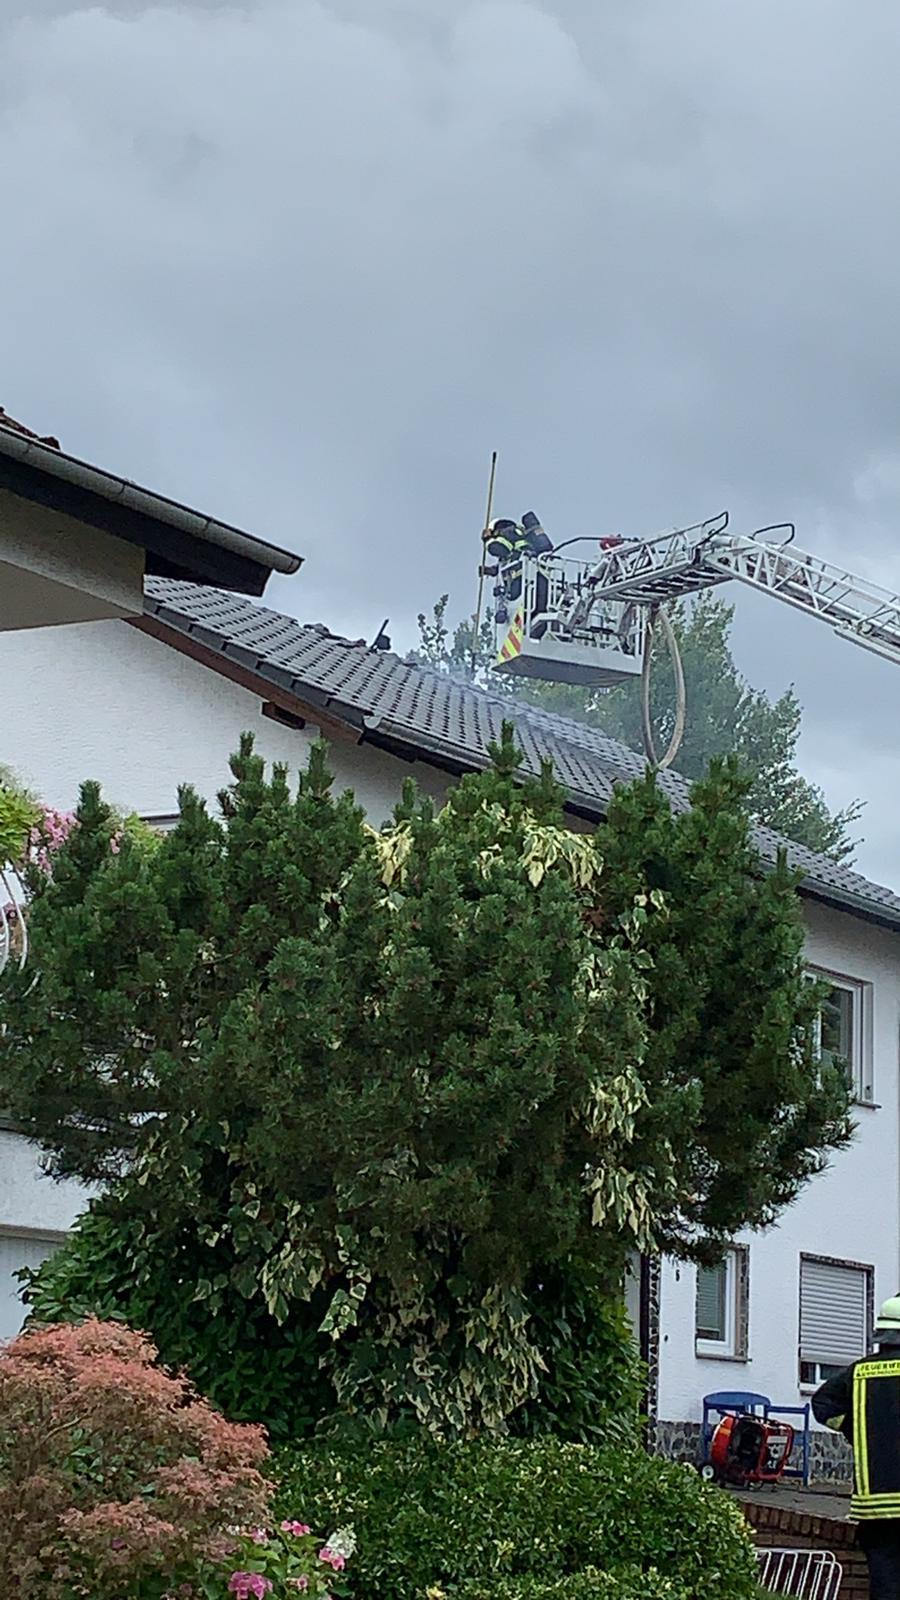 20190810_Dachstuhlbrand Hüffelsheim (26)